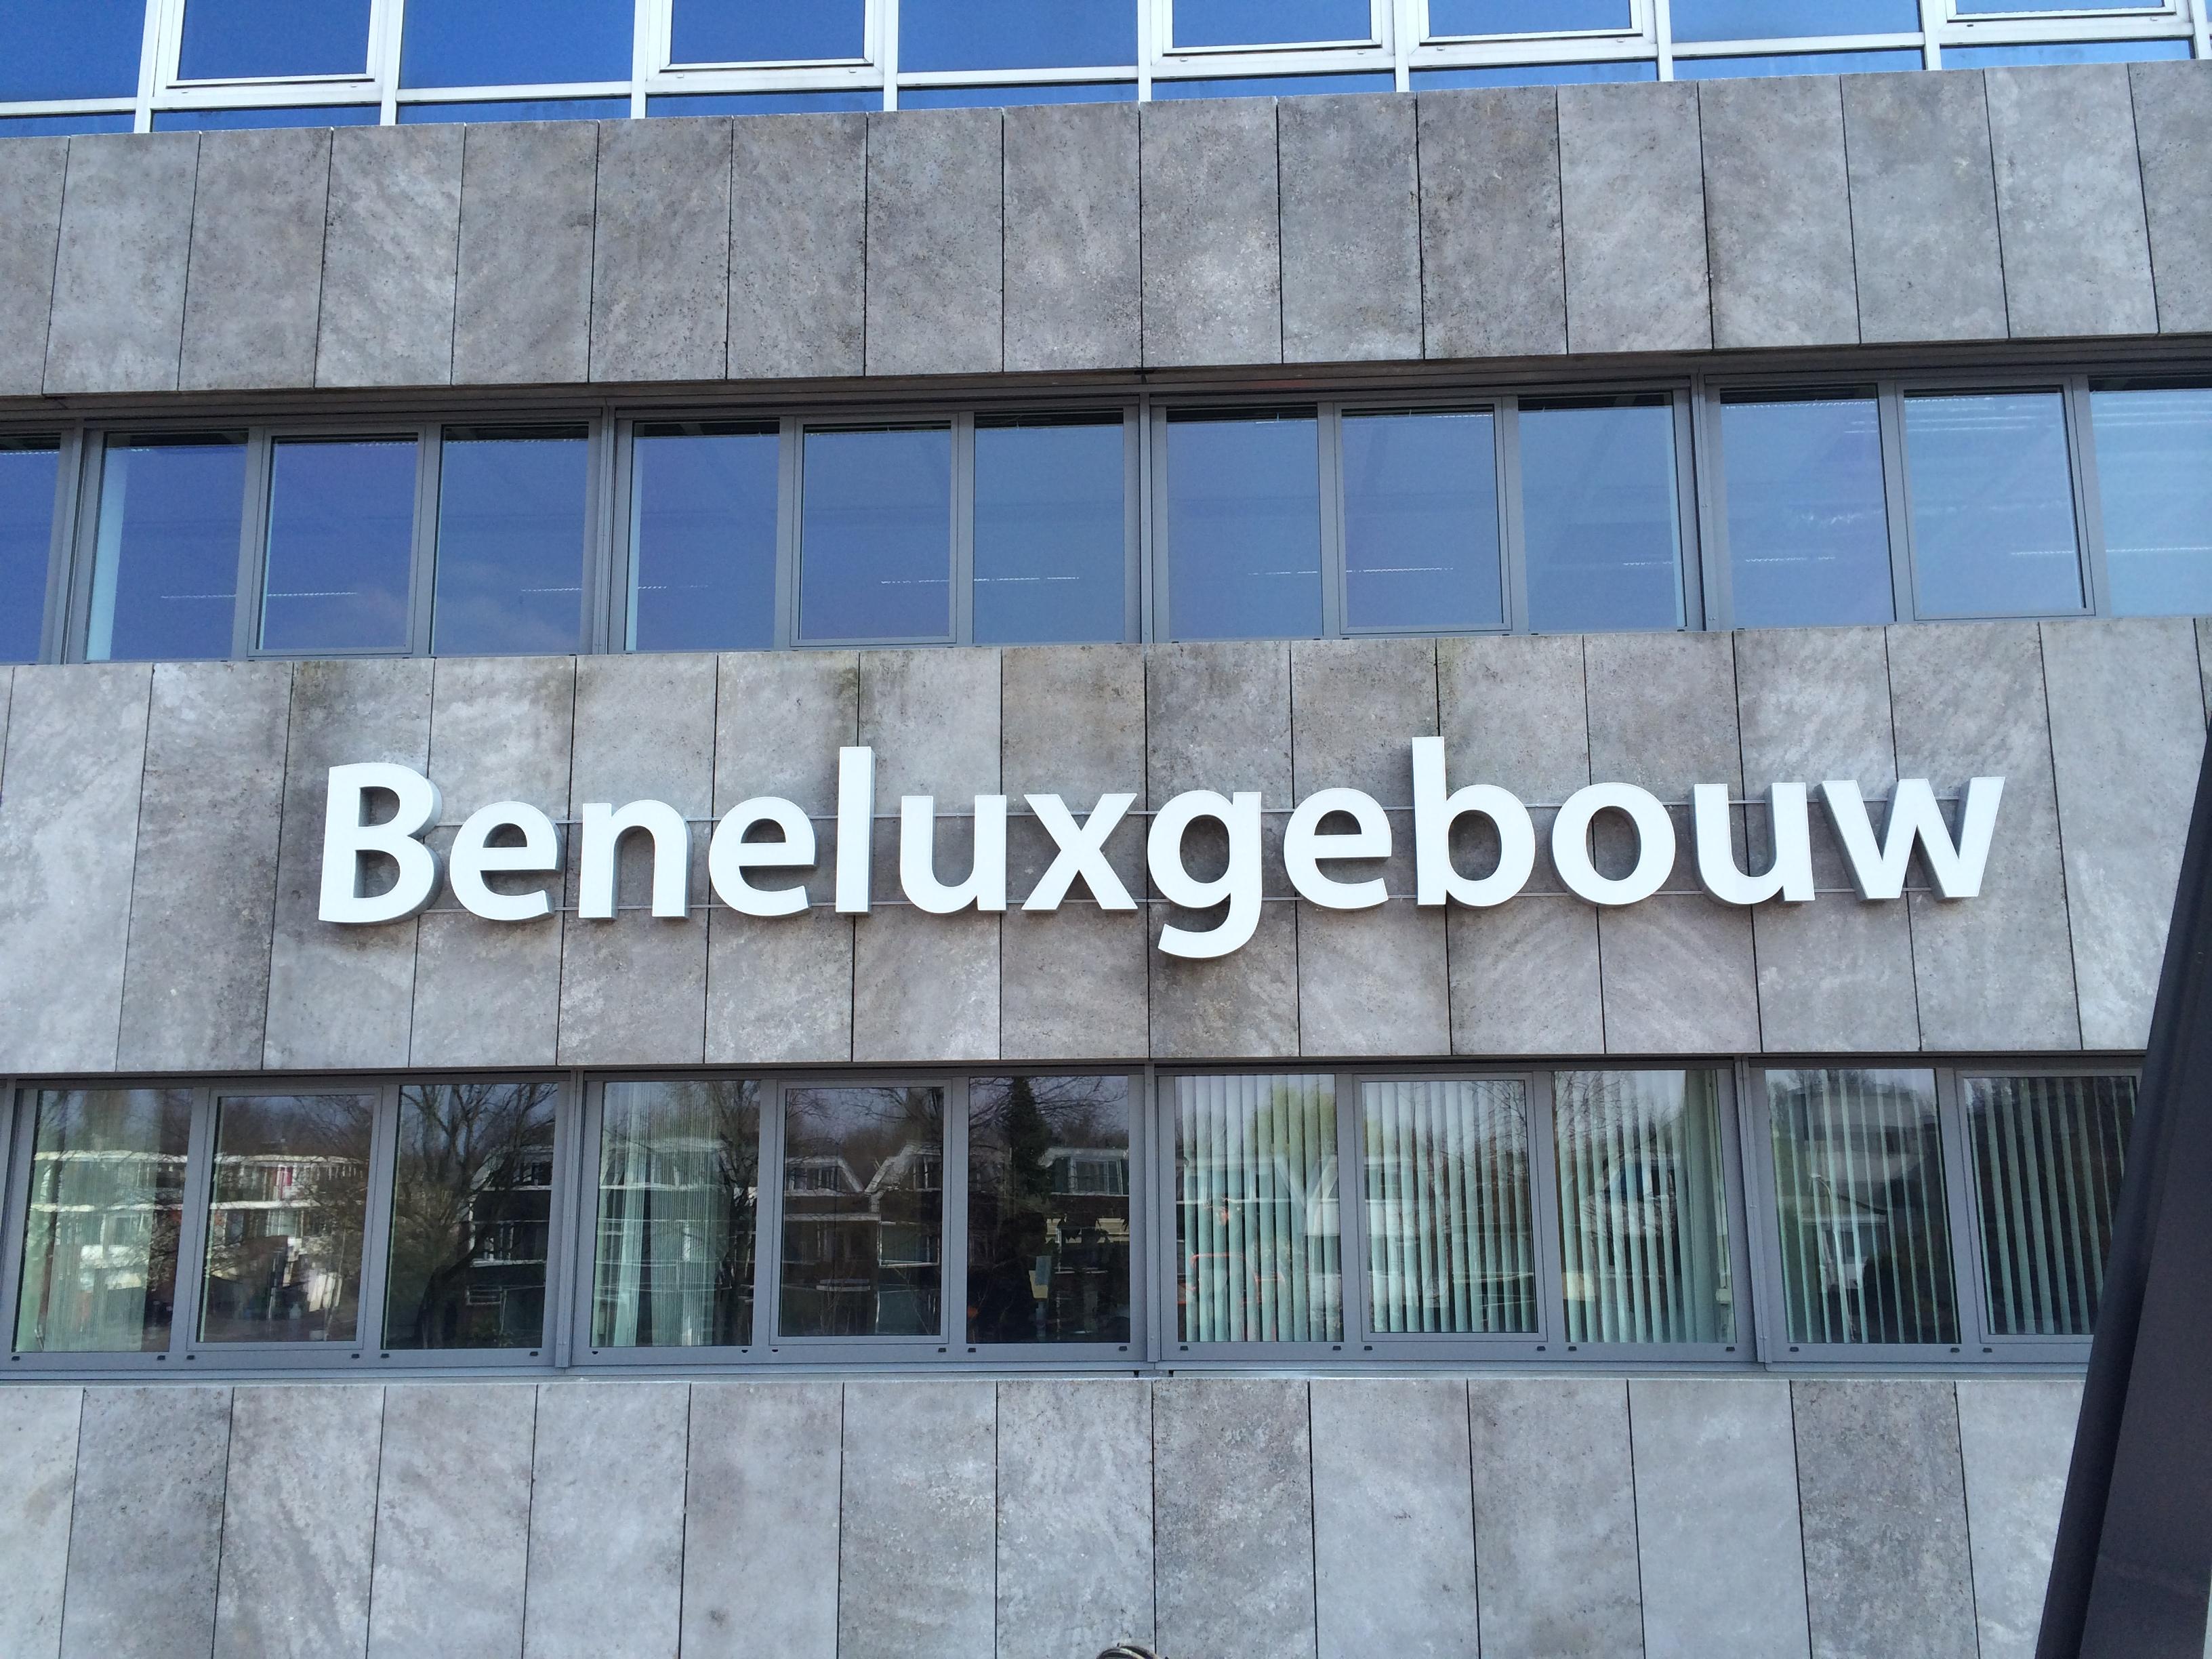 LED Beneluxgebouw